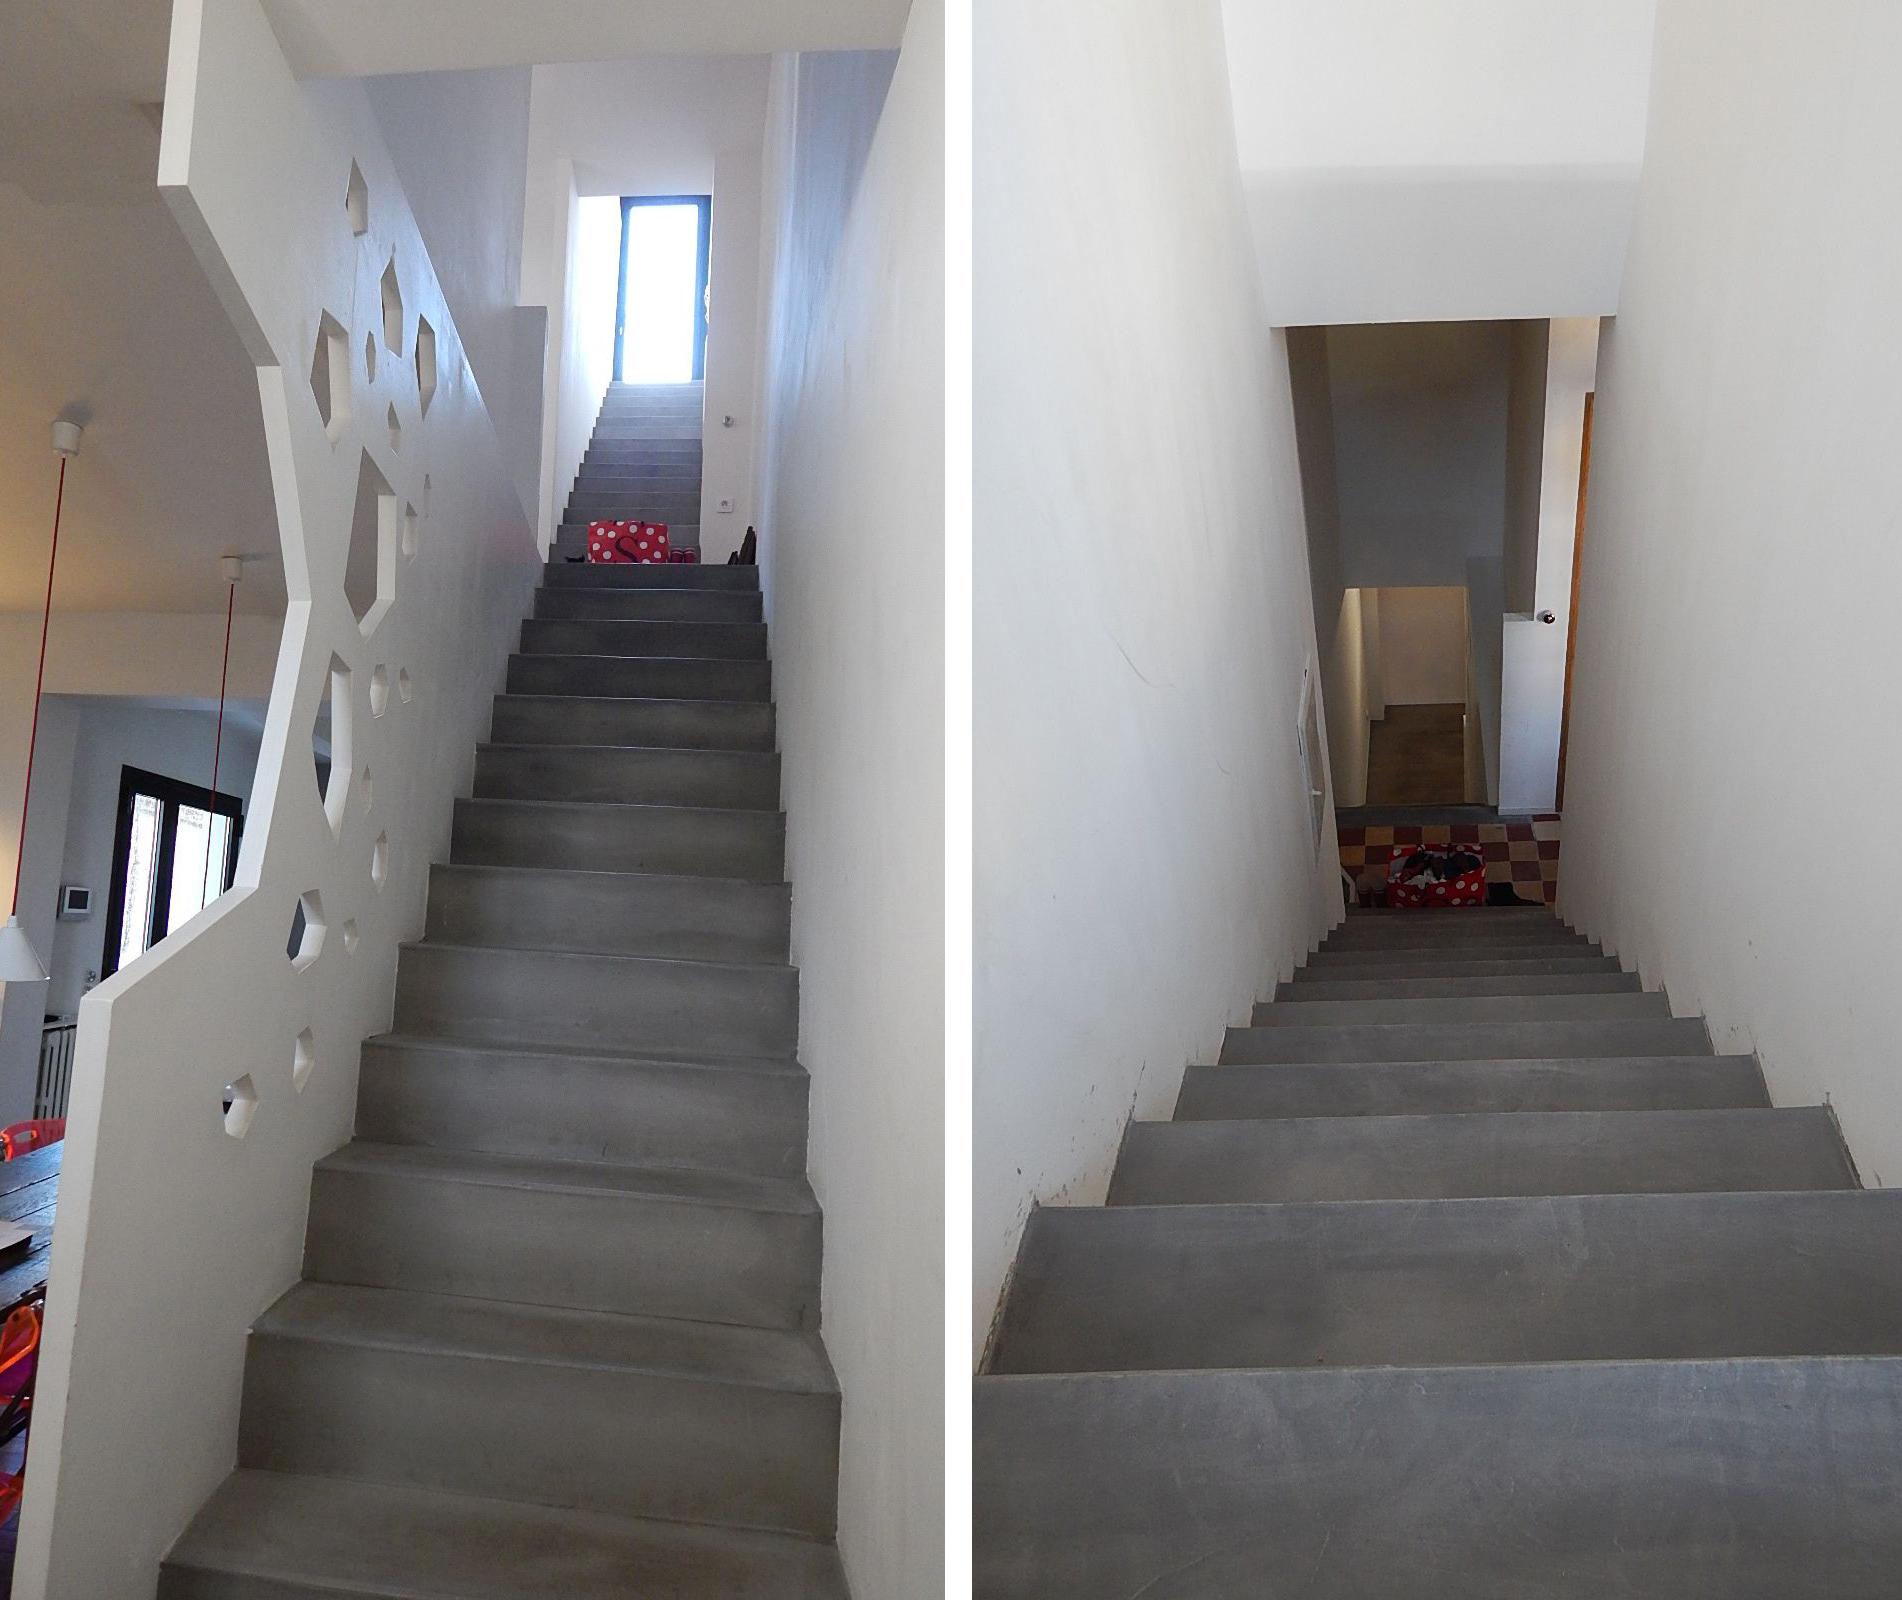 12-Escaliers_St Ouen.jpg